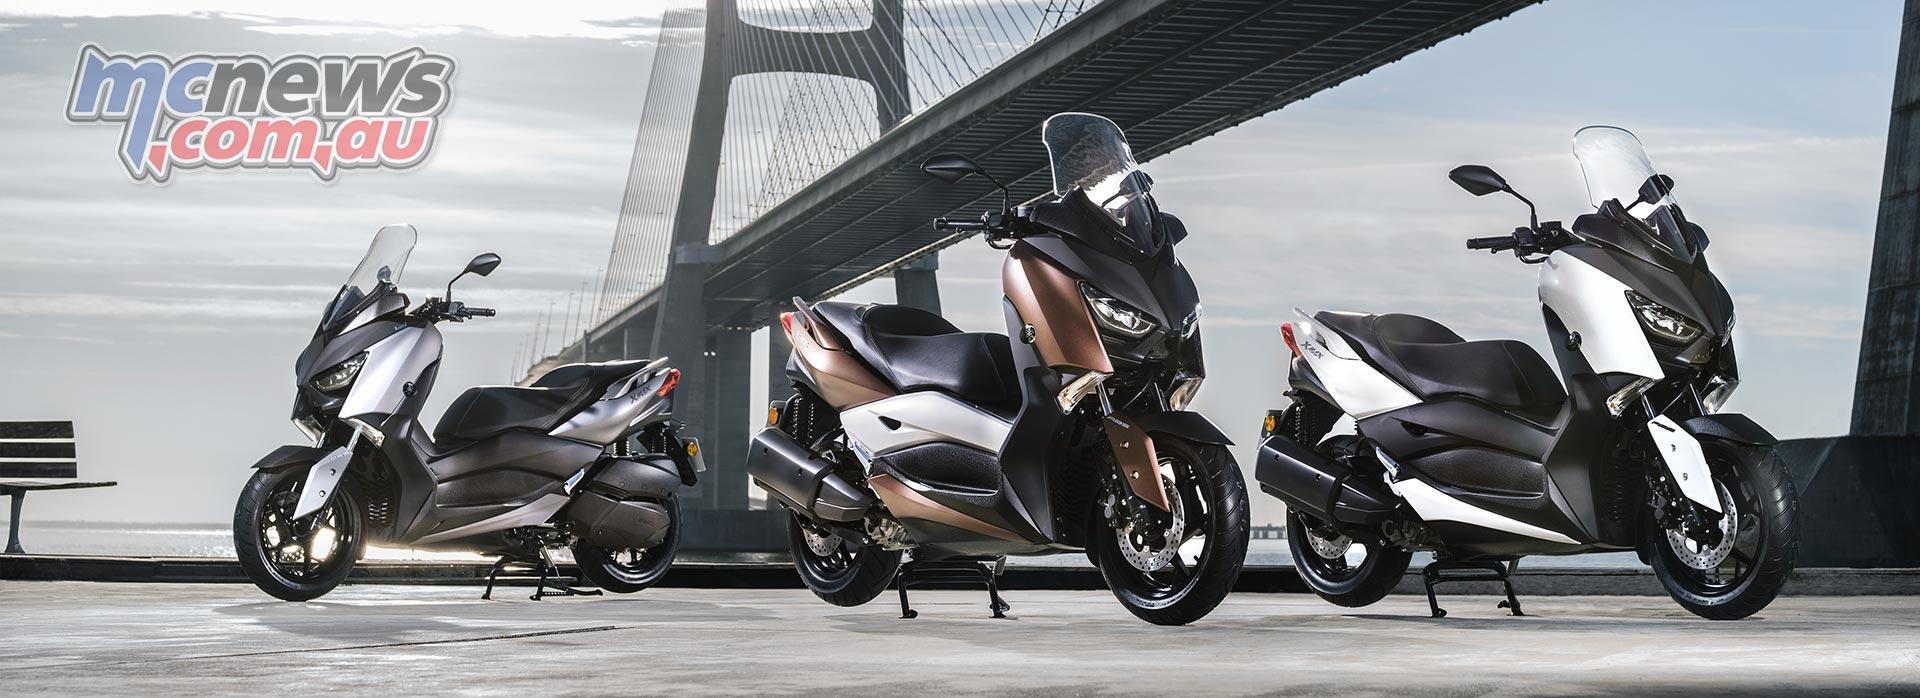 2017 Yamaha X-Max 300   New big scoot from Yamaha   MCNews